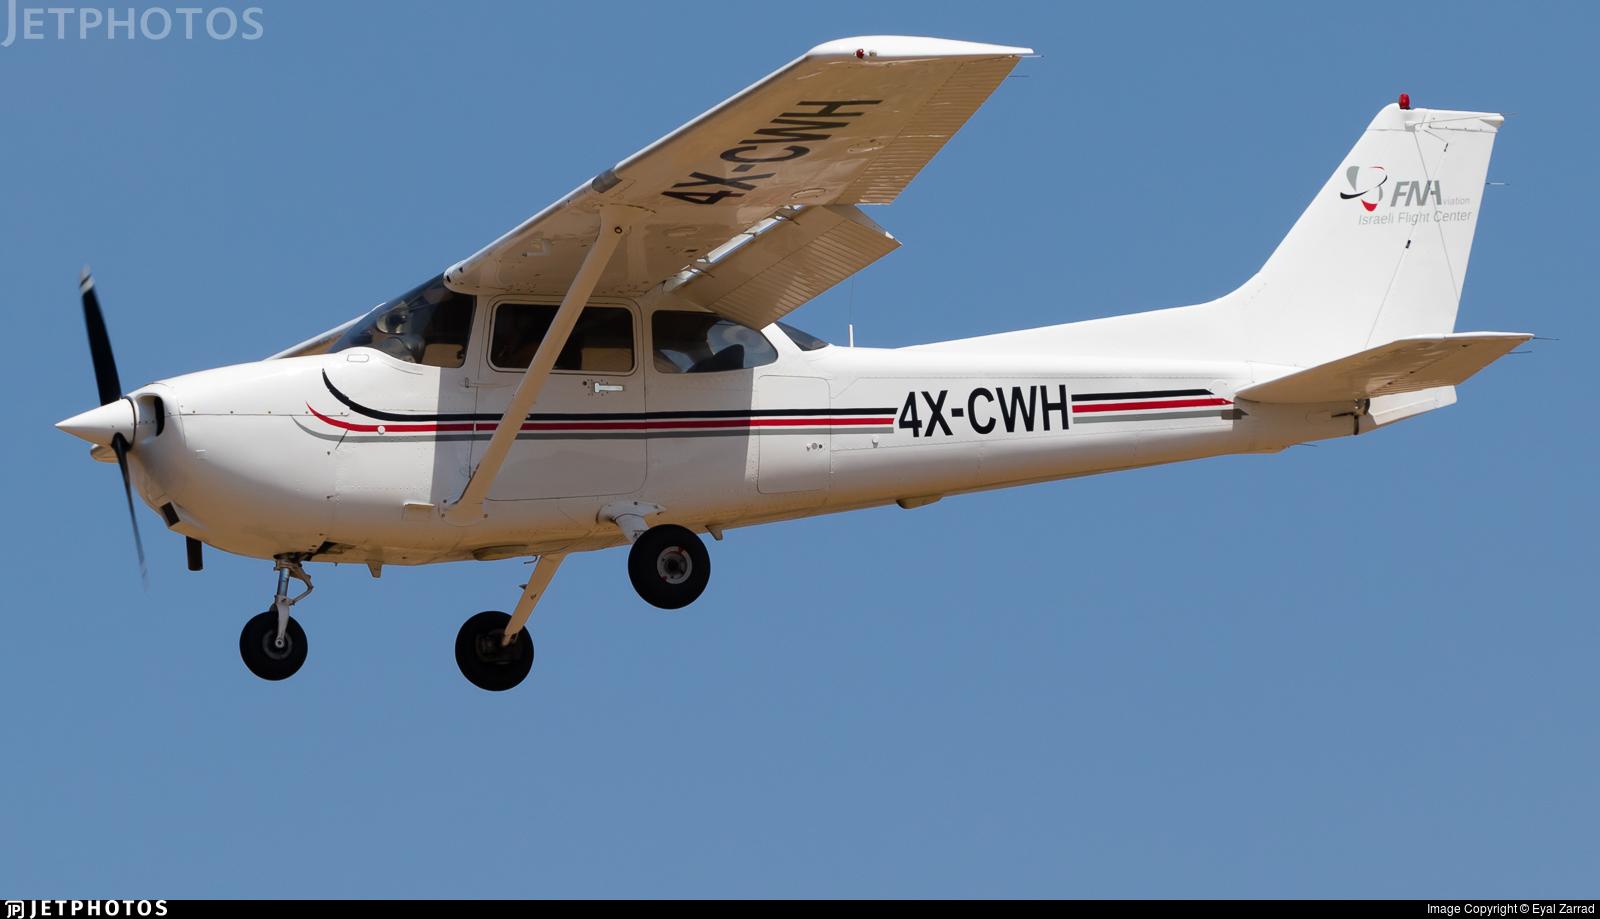 4X-CWH - Cessna 172S Skyhawk - FN Aviation